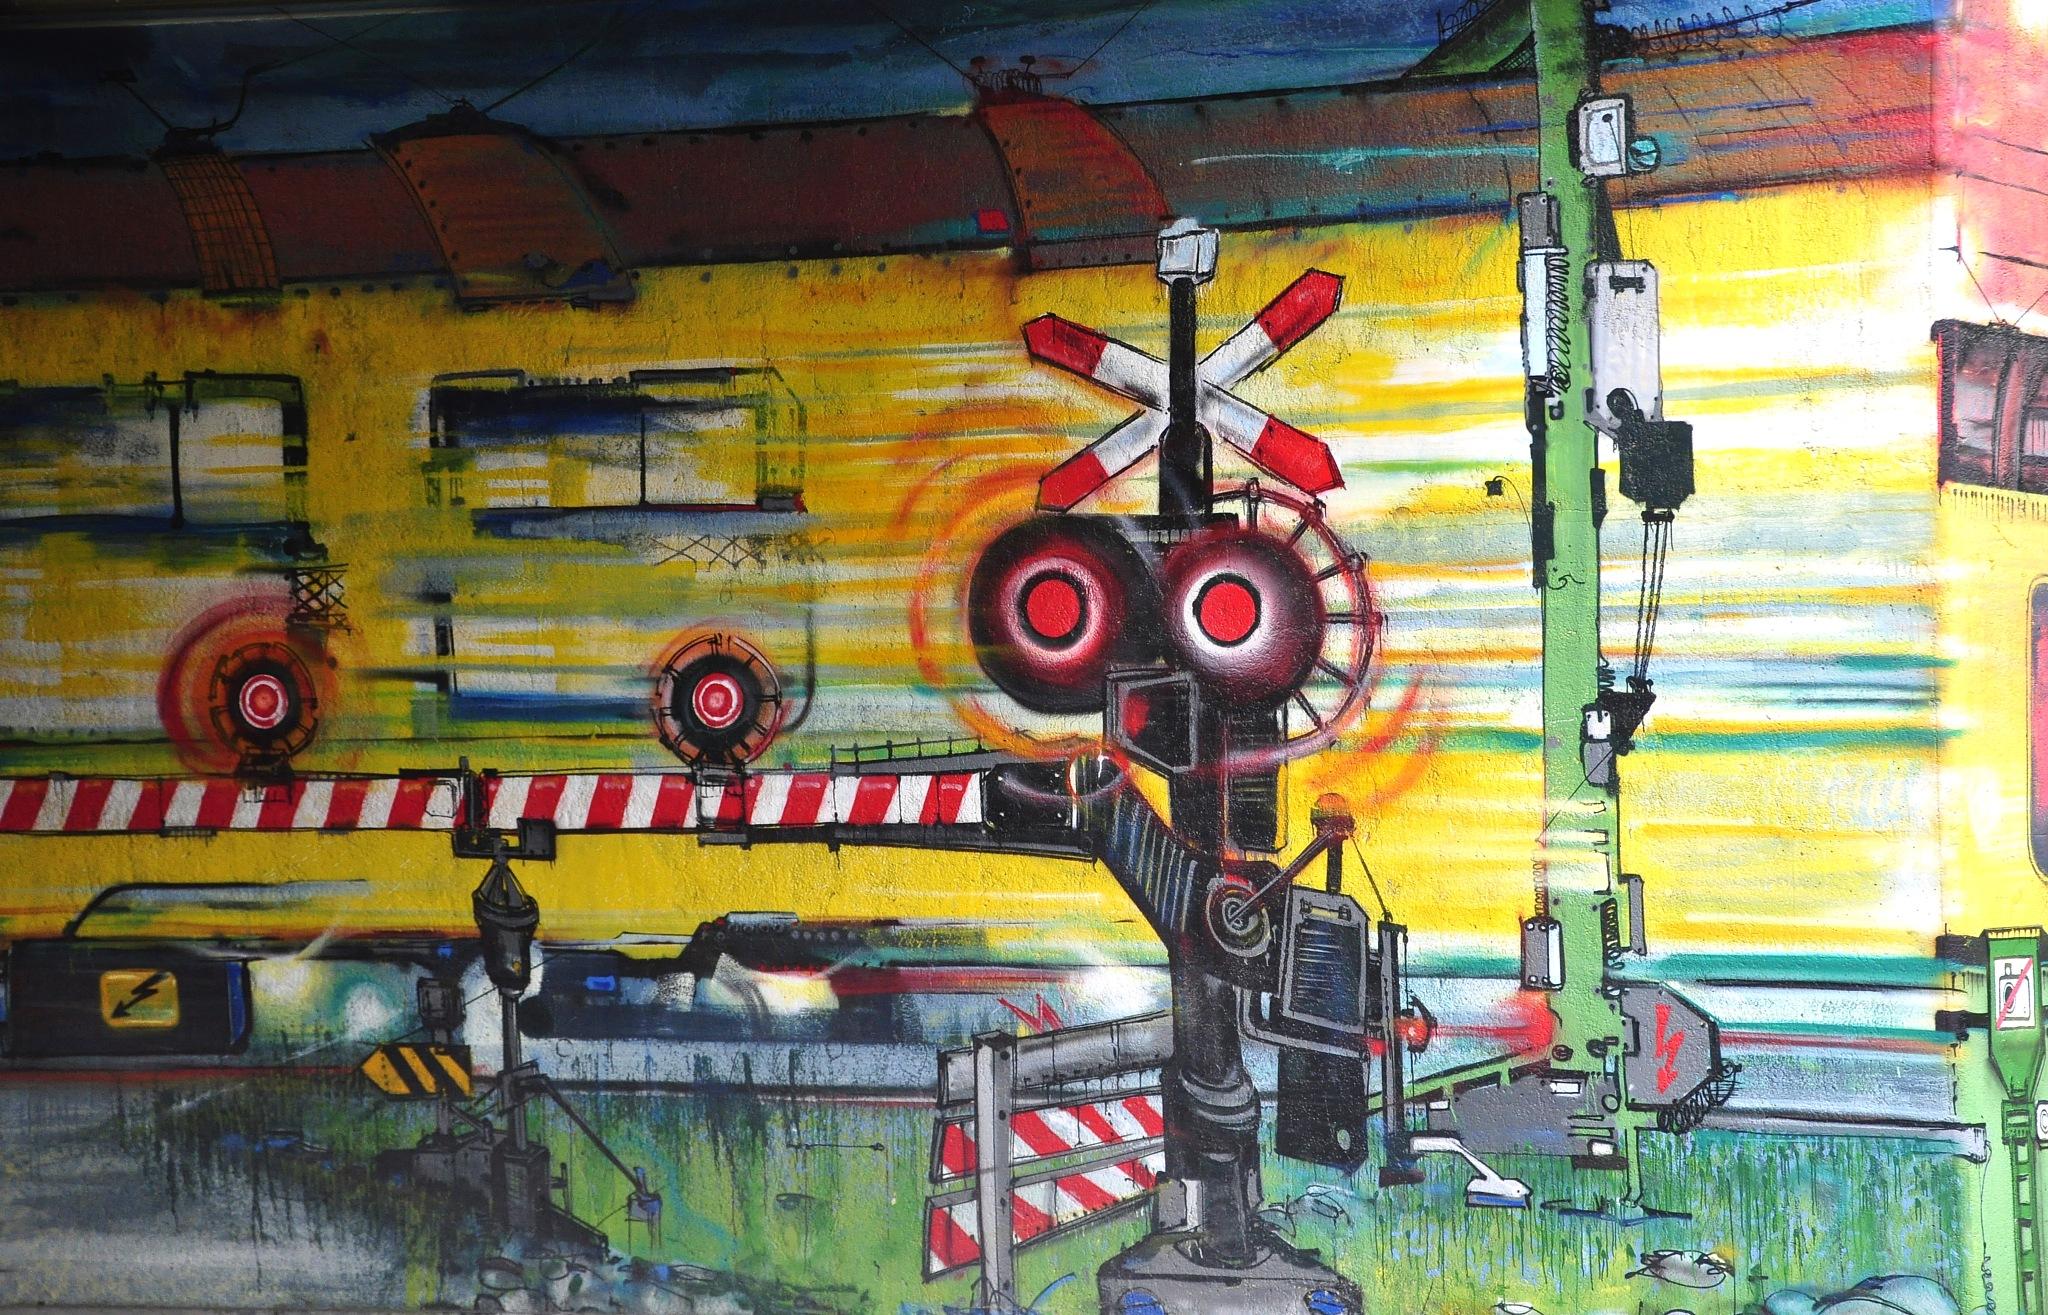 Graffity in Zwolle by Jacob van der Veen